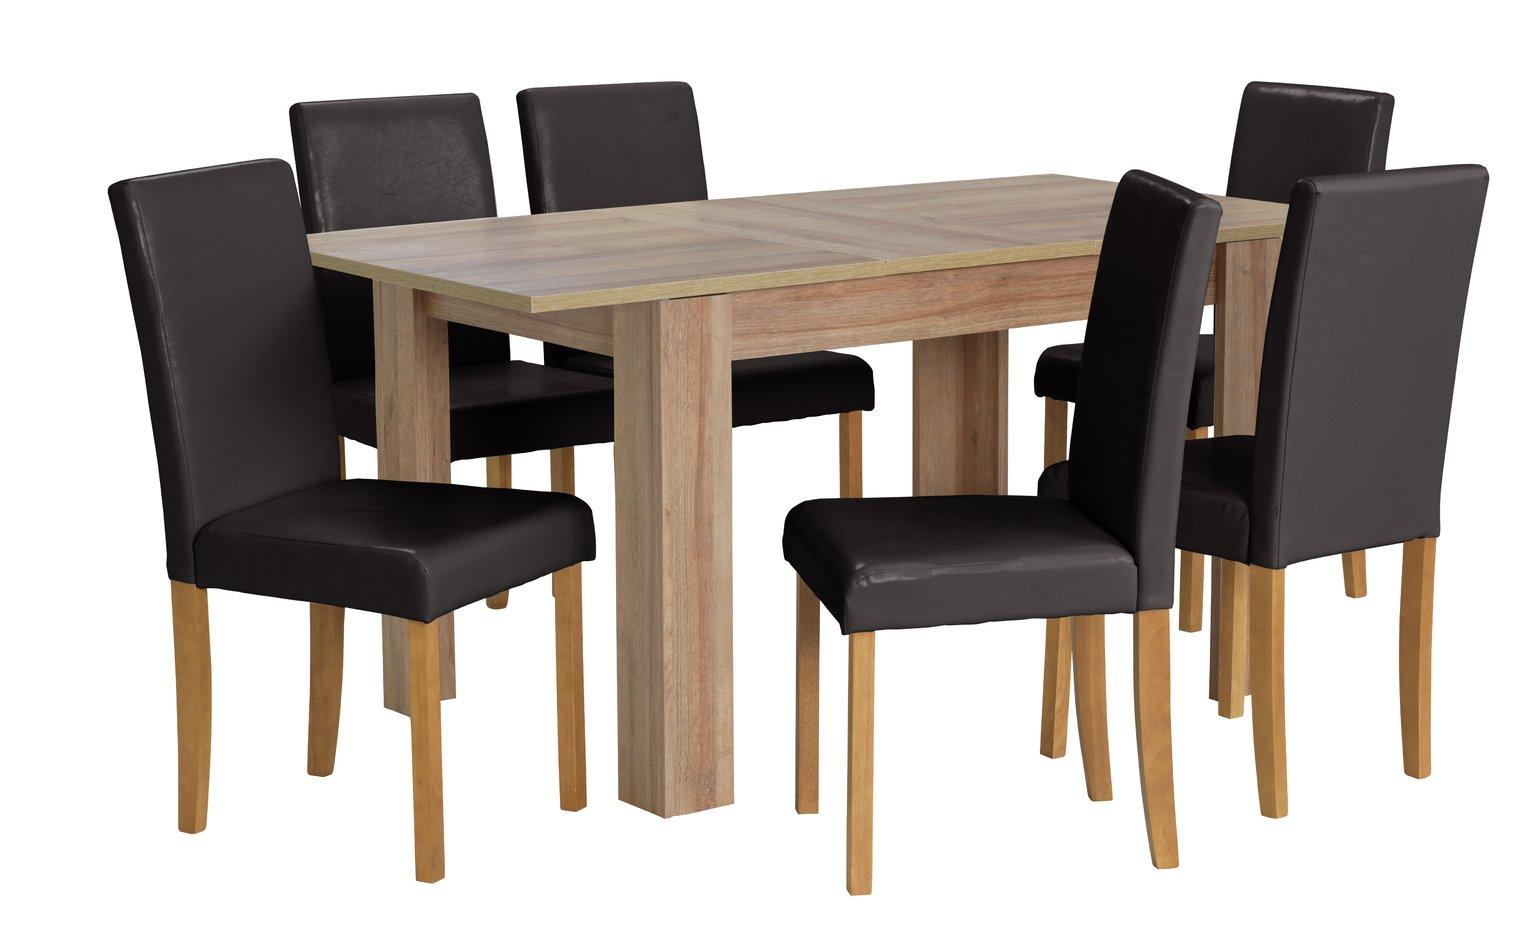 HOME Miami Extendable Oak Veneer Table & 6 Chairs - Black